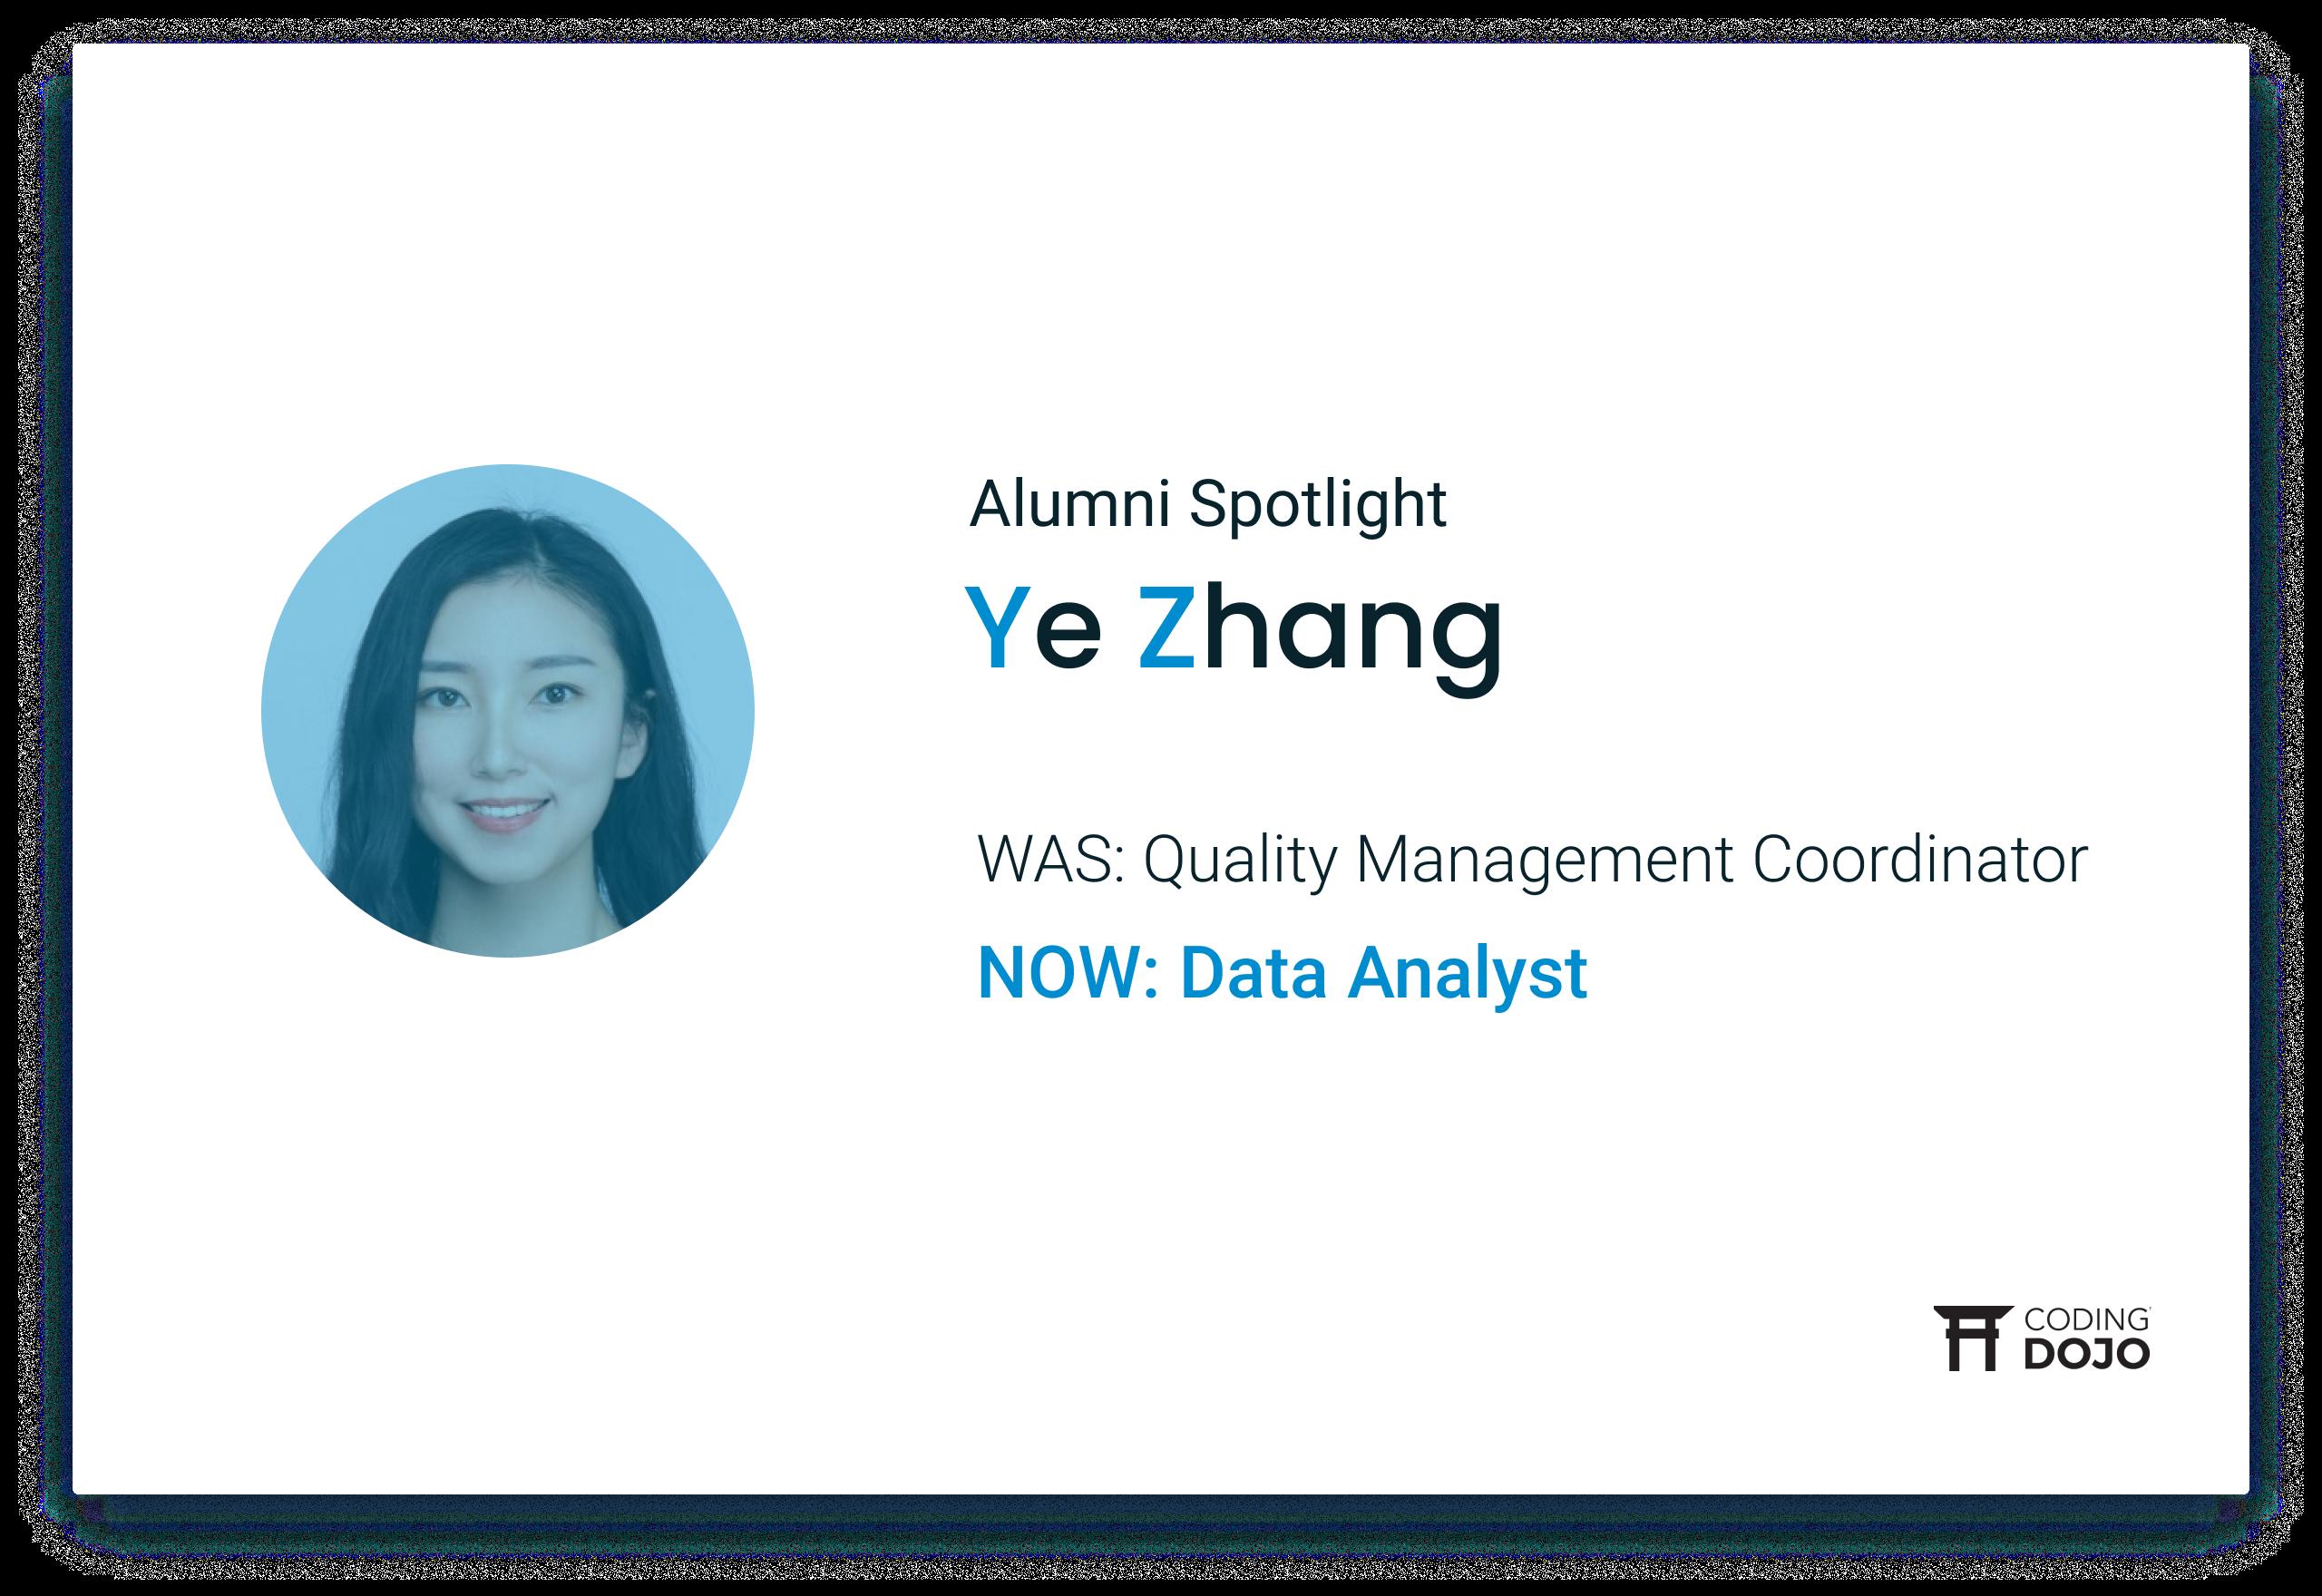 Coding Dojo Alumni Success | Ye Zhang